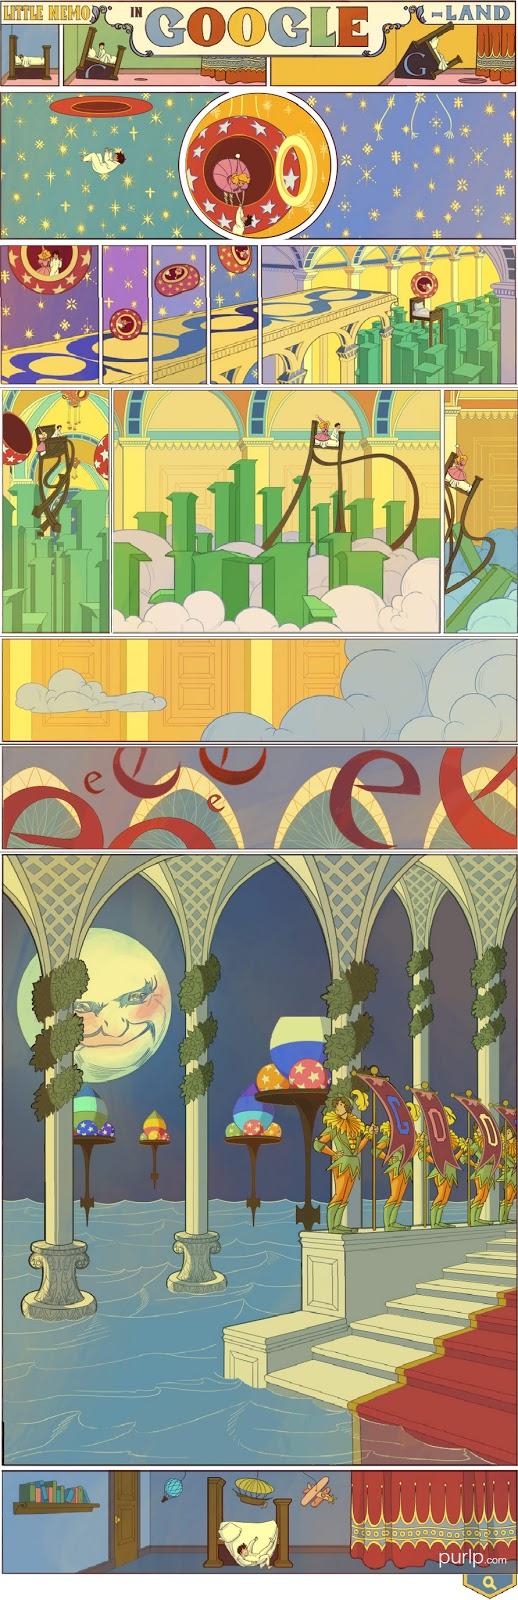 Google Doodle 15 October 2012